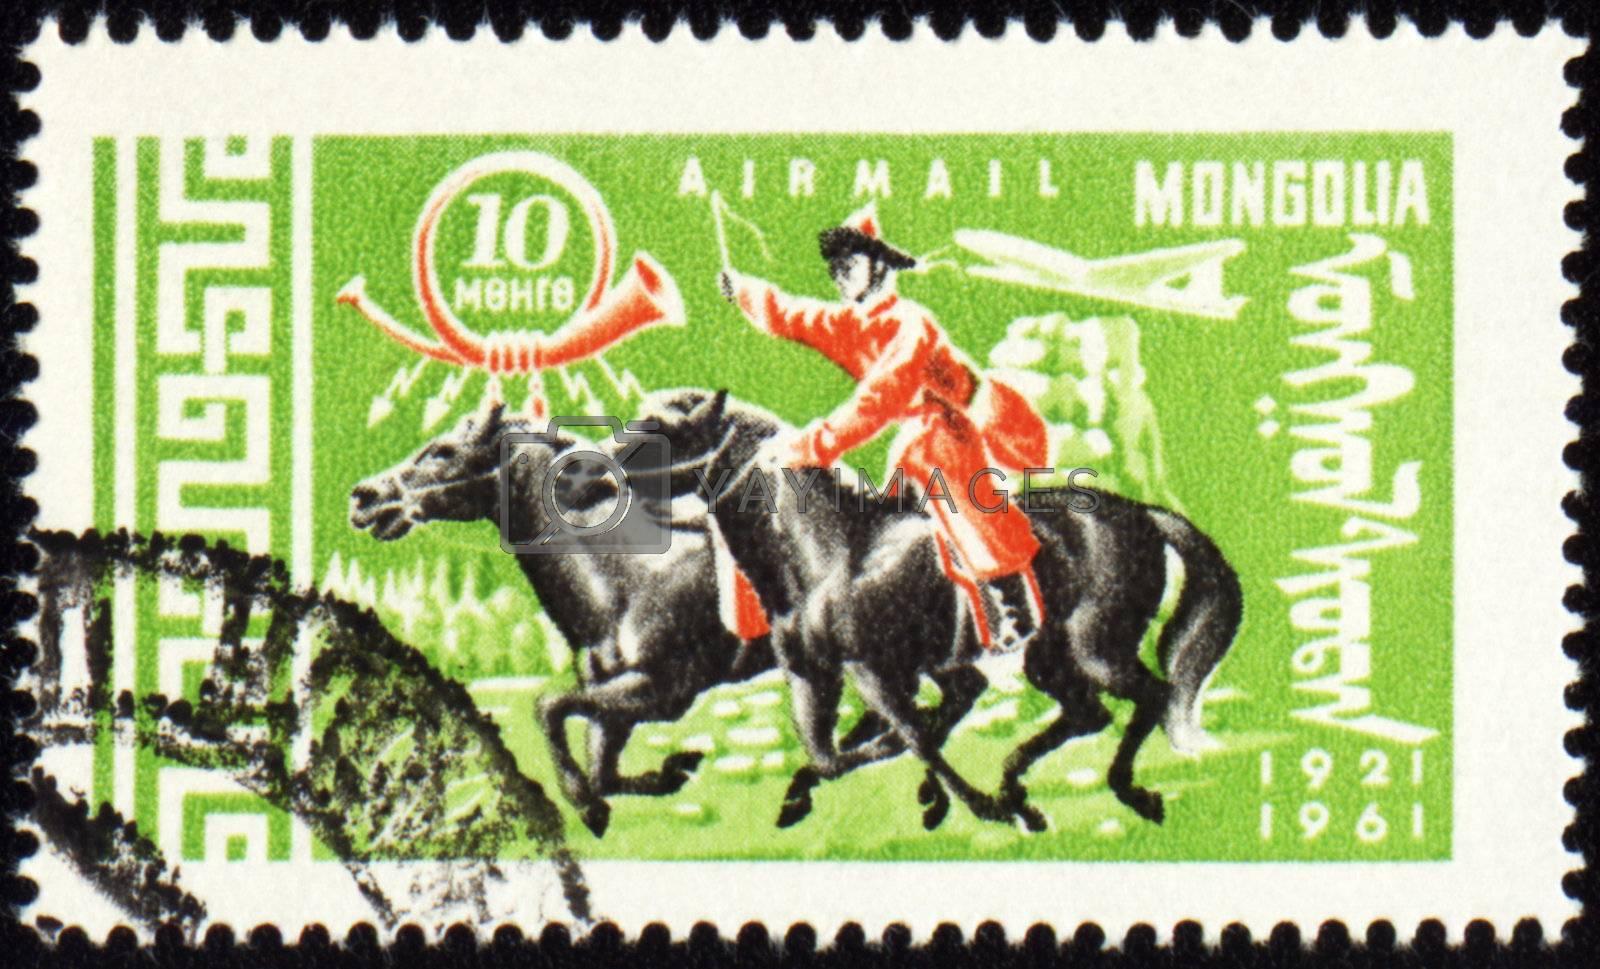 MONGOLIA - CIRCA 1961: stamp printed in Mongolia, shows Mongolian rider on horse, series, circa 1961